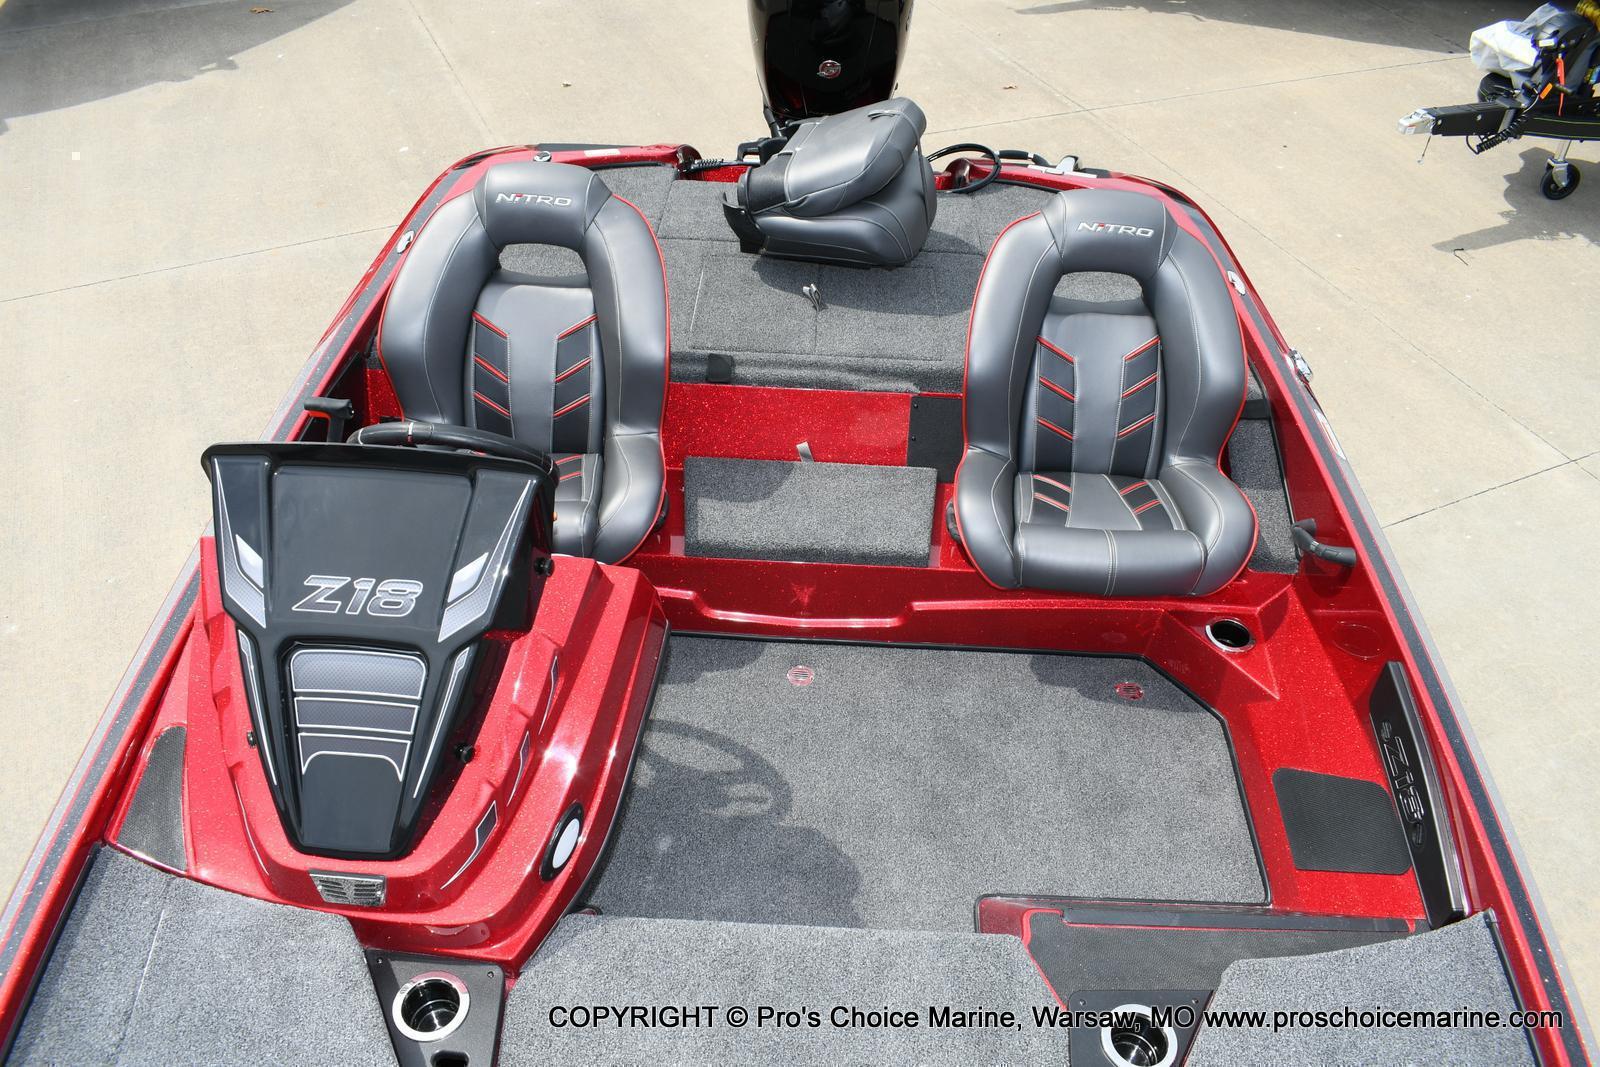 2020 Nitro boat for sale, model of the boat is Z18 & Image # 10 of 50